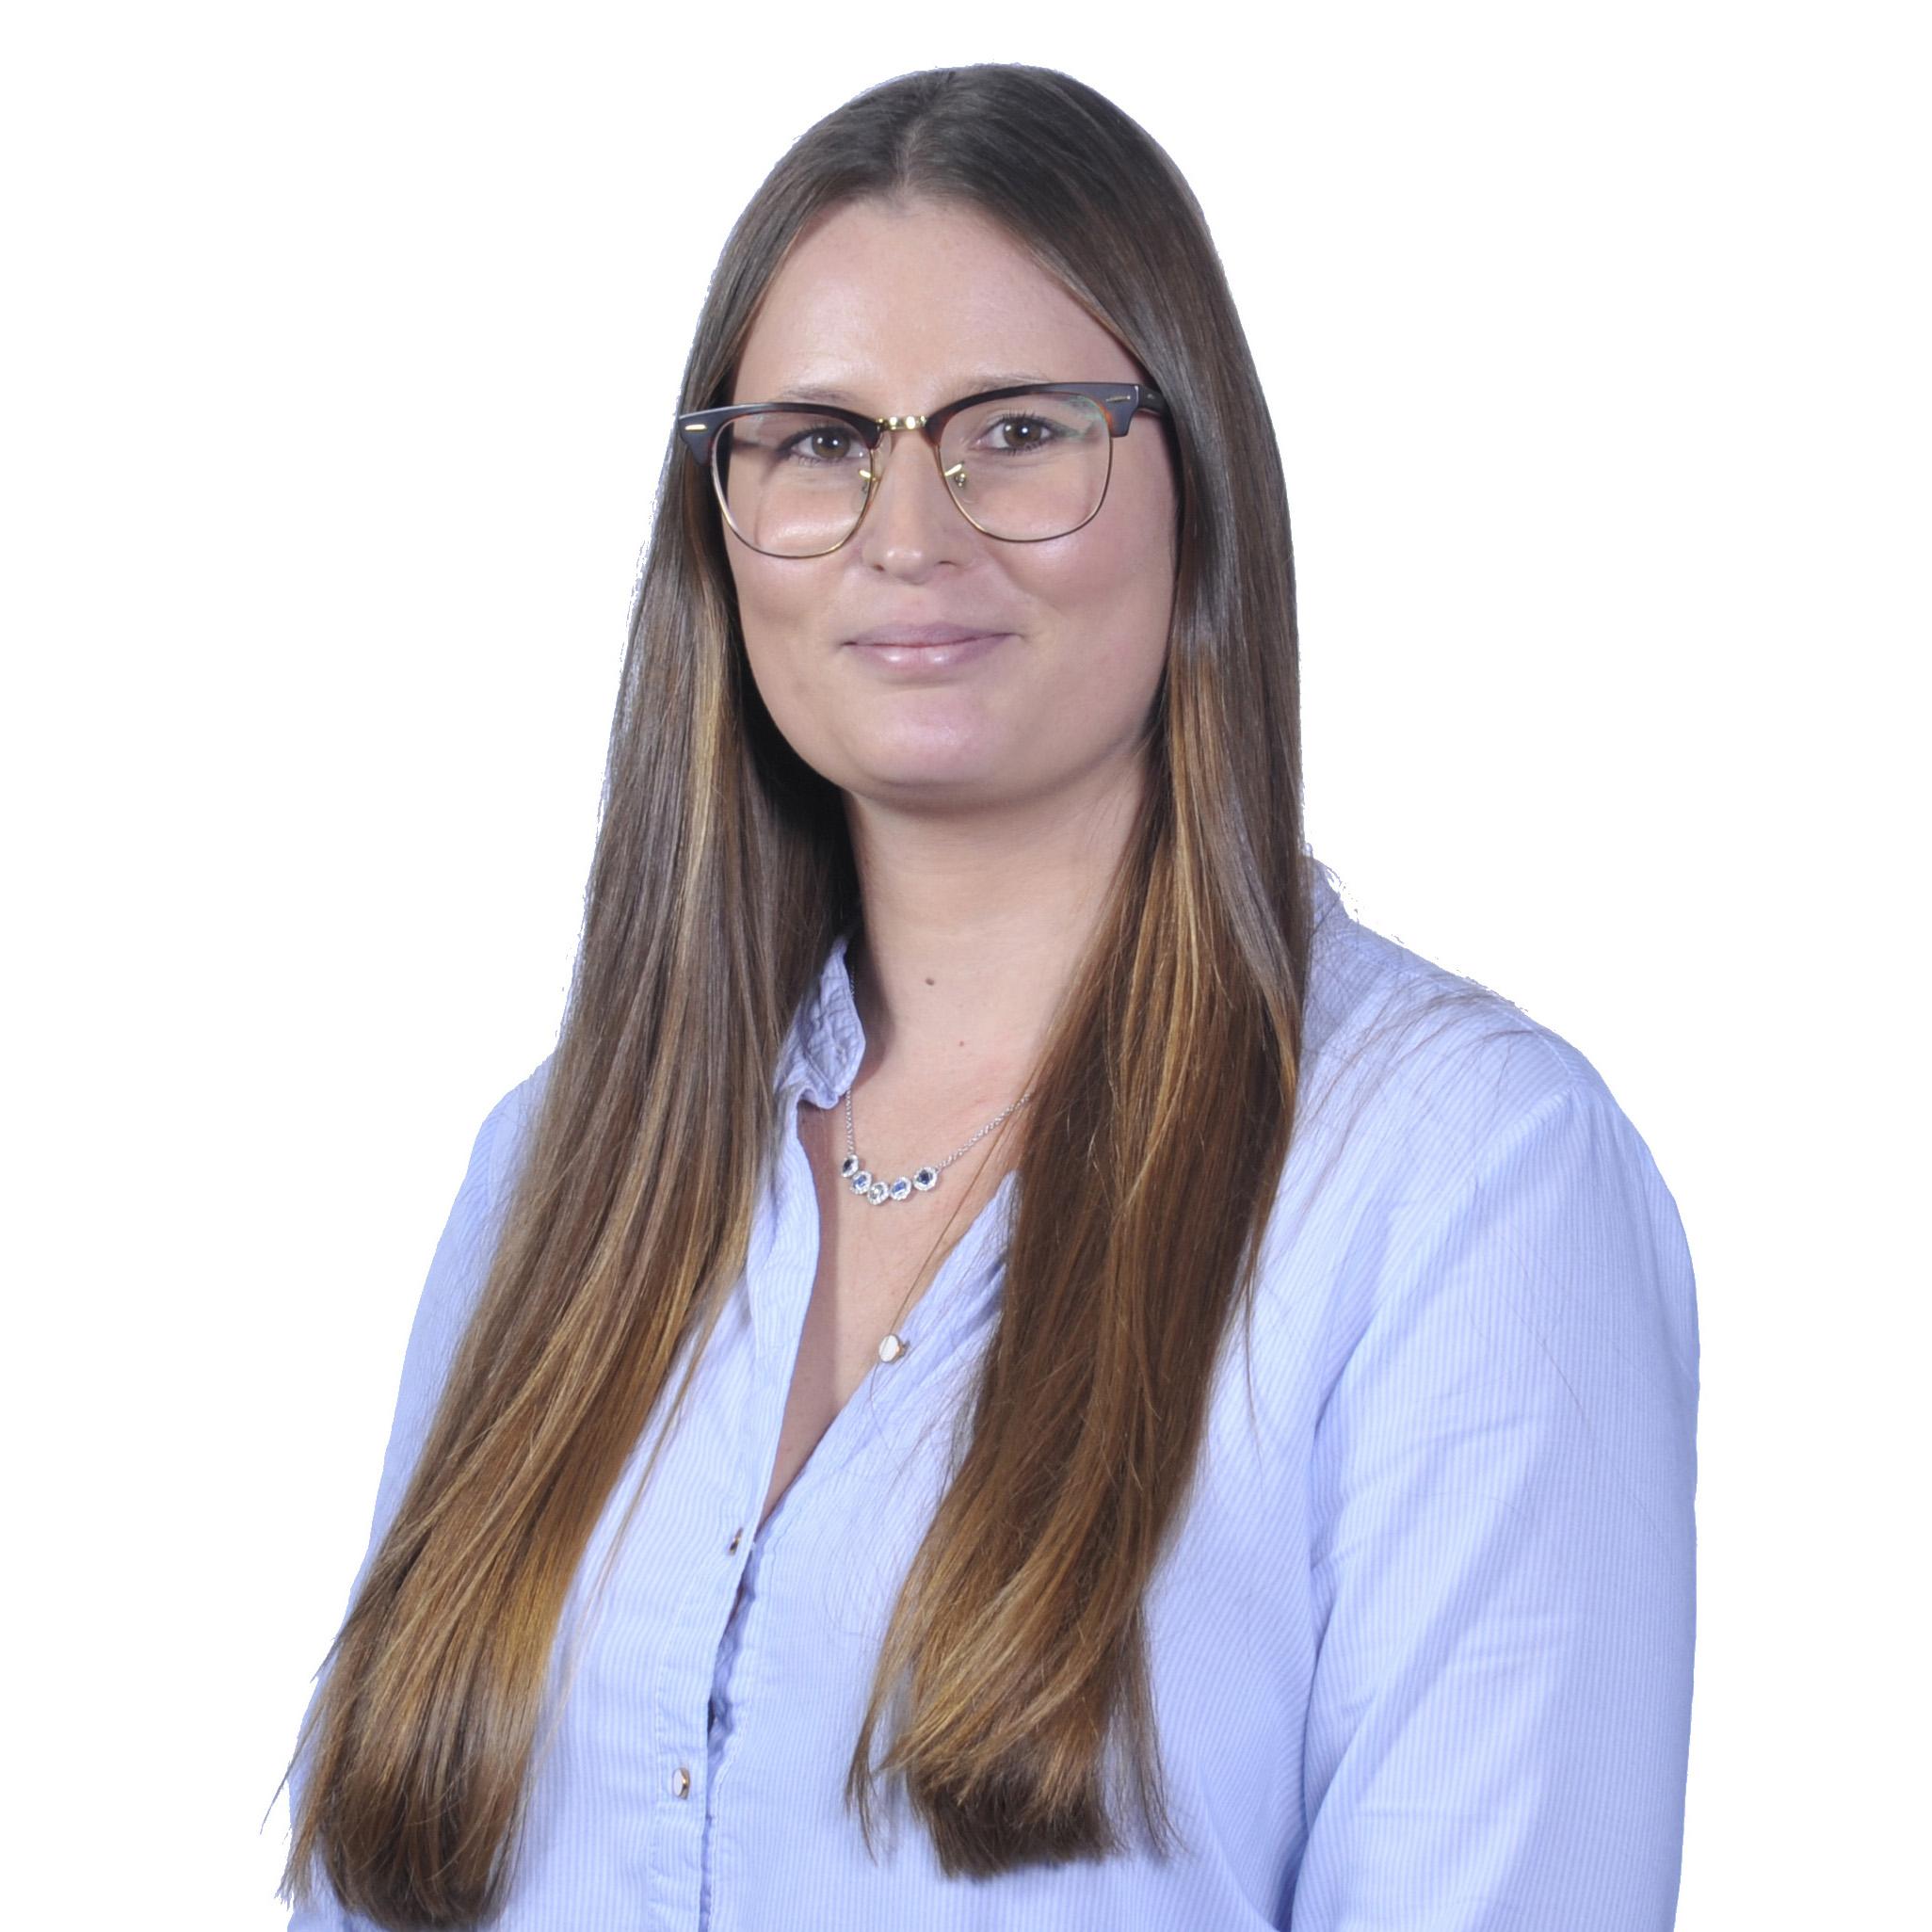 Megan BICCHIERAY